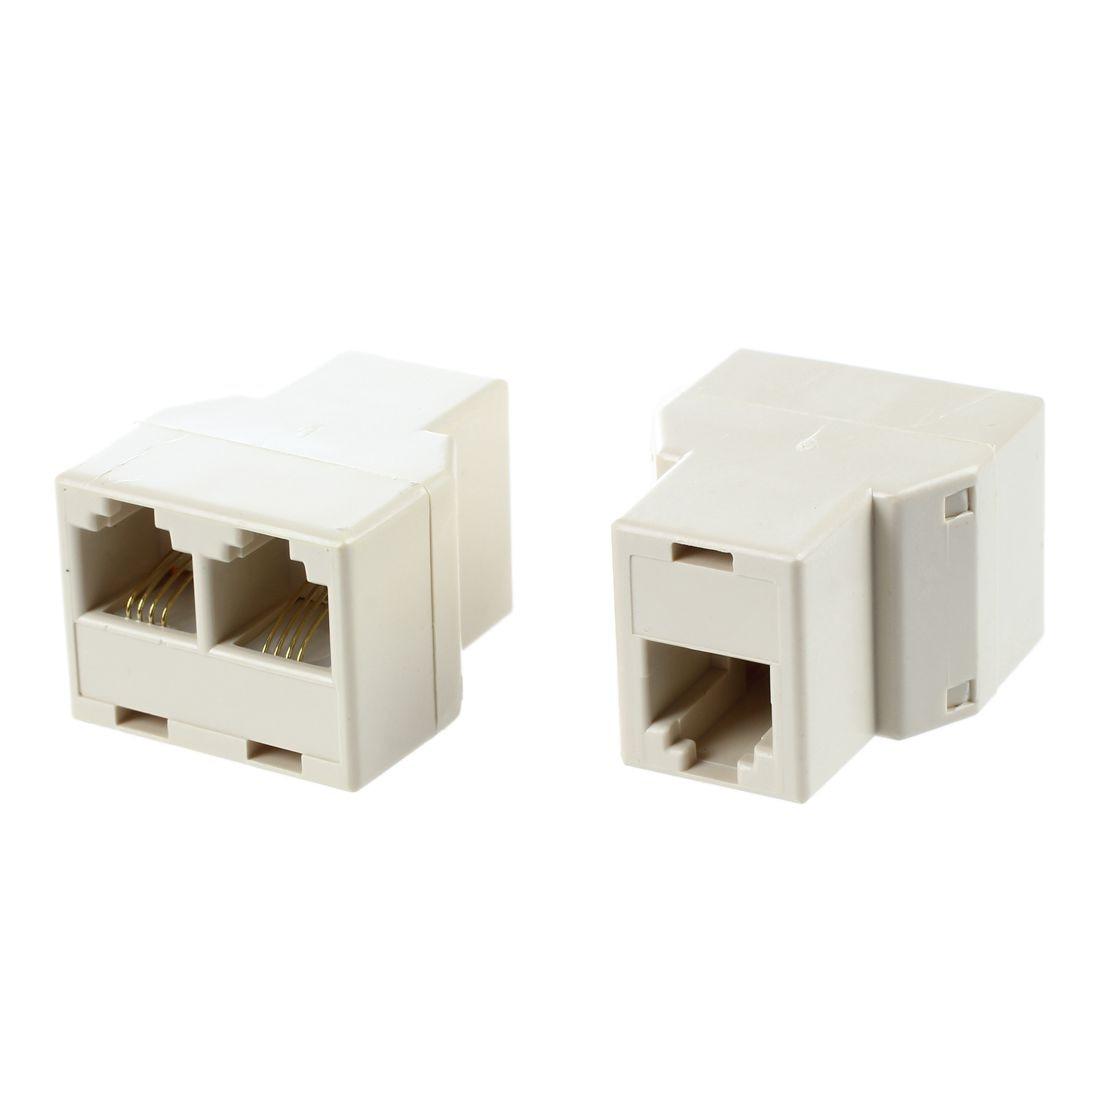 RJ11 6P4C 1 to 2 Female Plug Telephone line Splitter Connector 10 Pcs